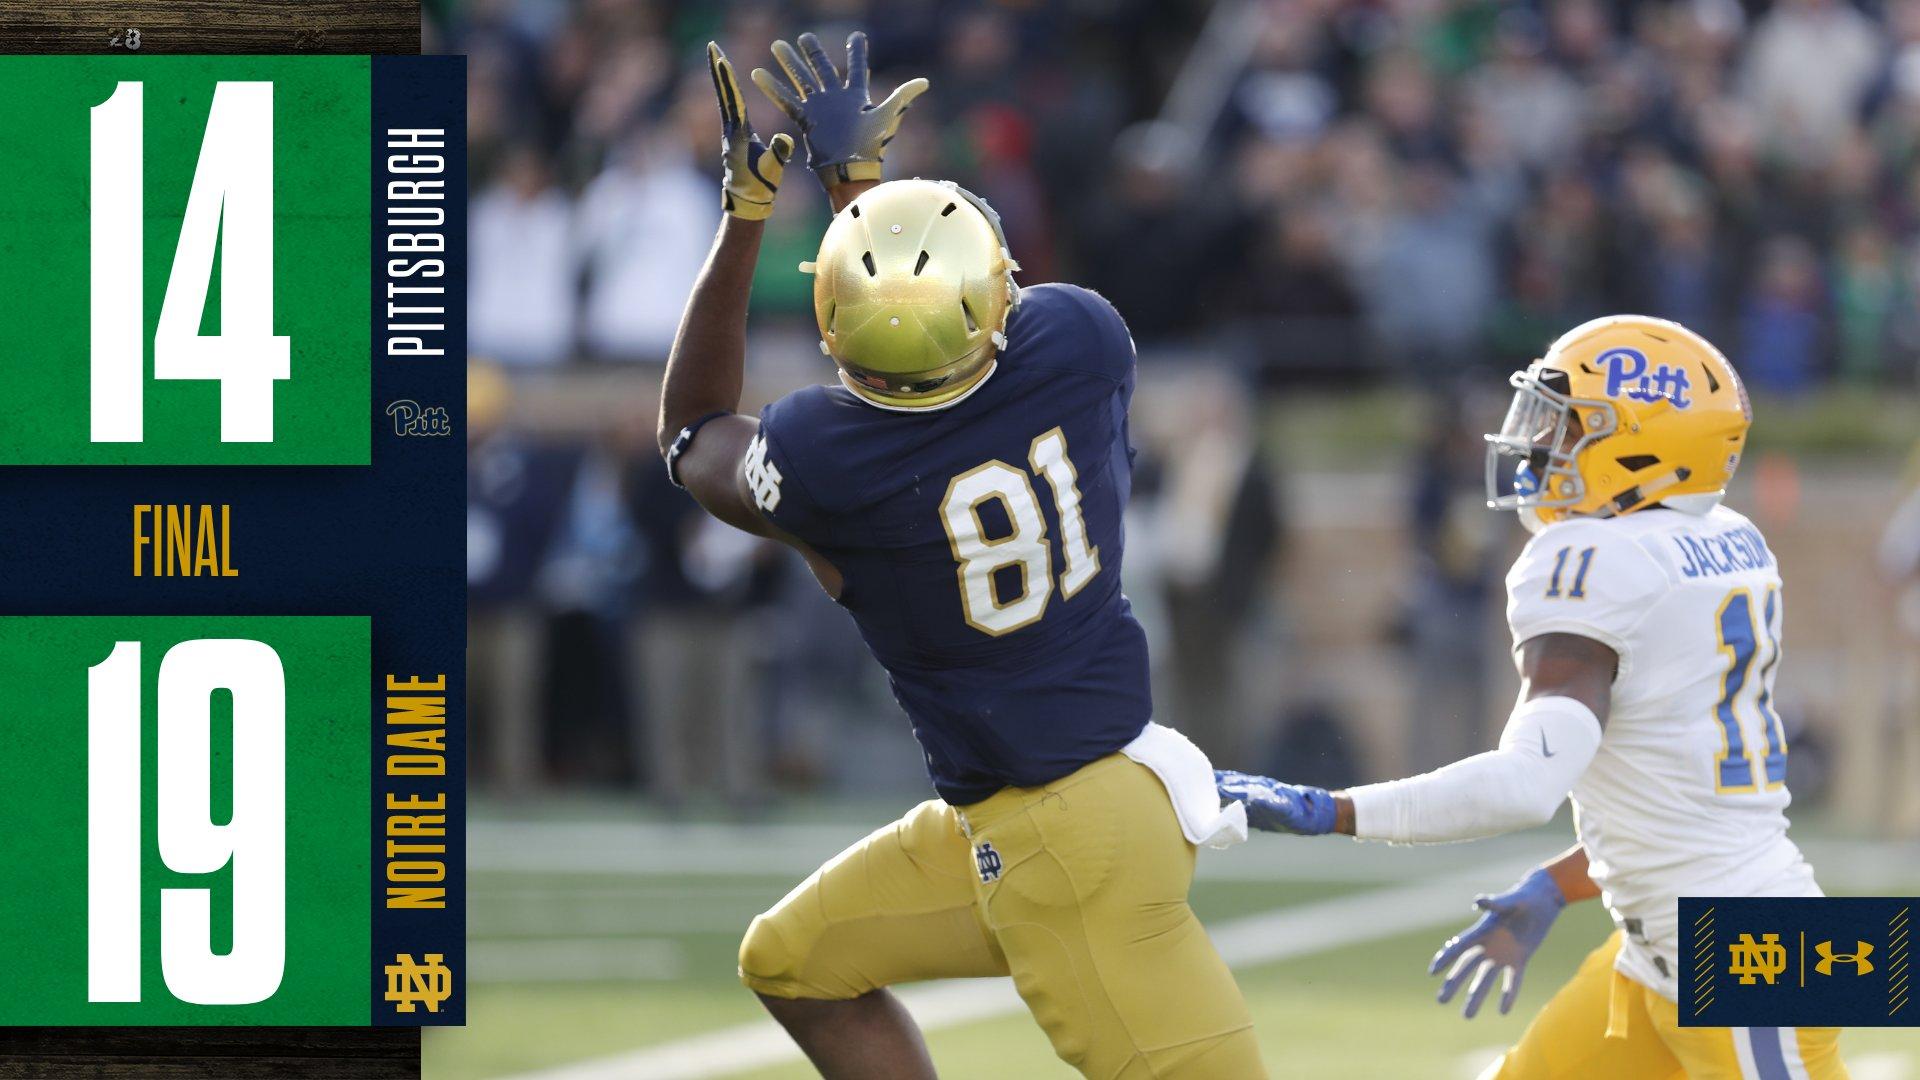 Notre Dame derrota Pitt